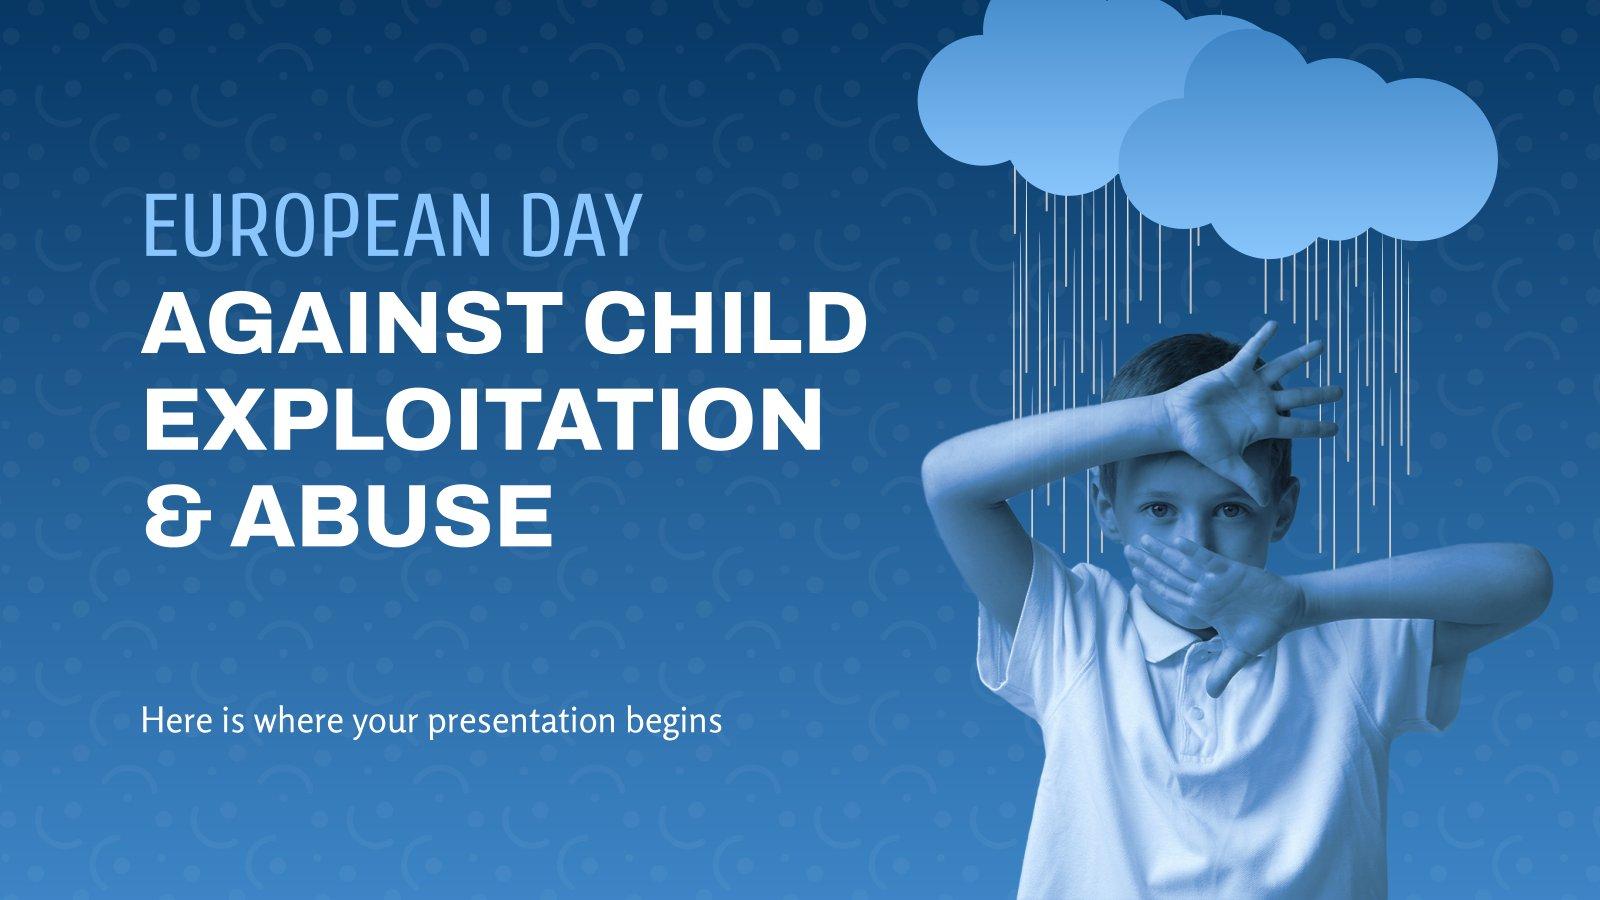 European Day Against Child Exploitation & Abuse presentation template